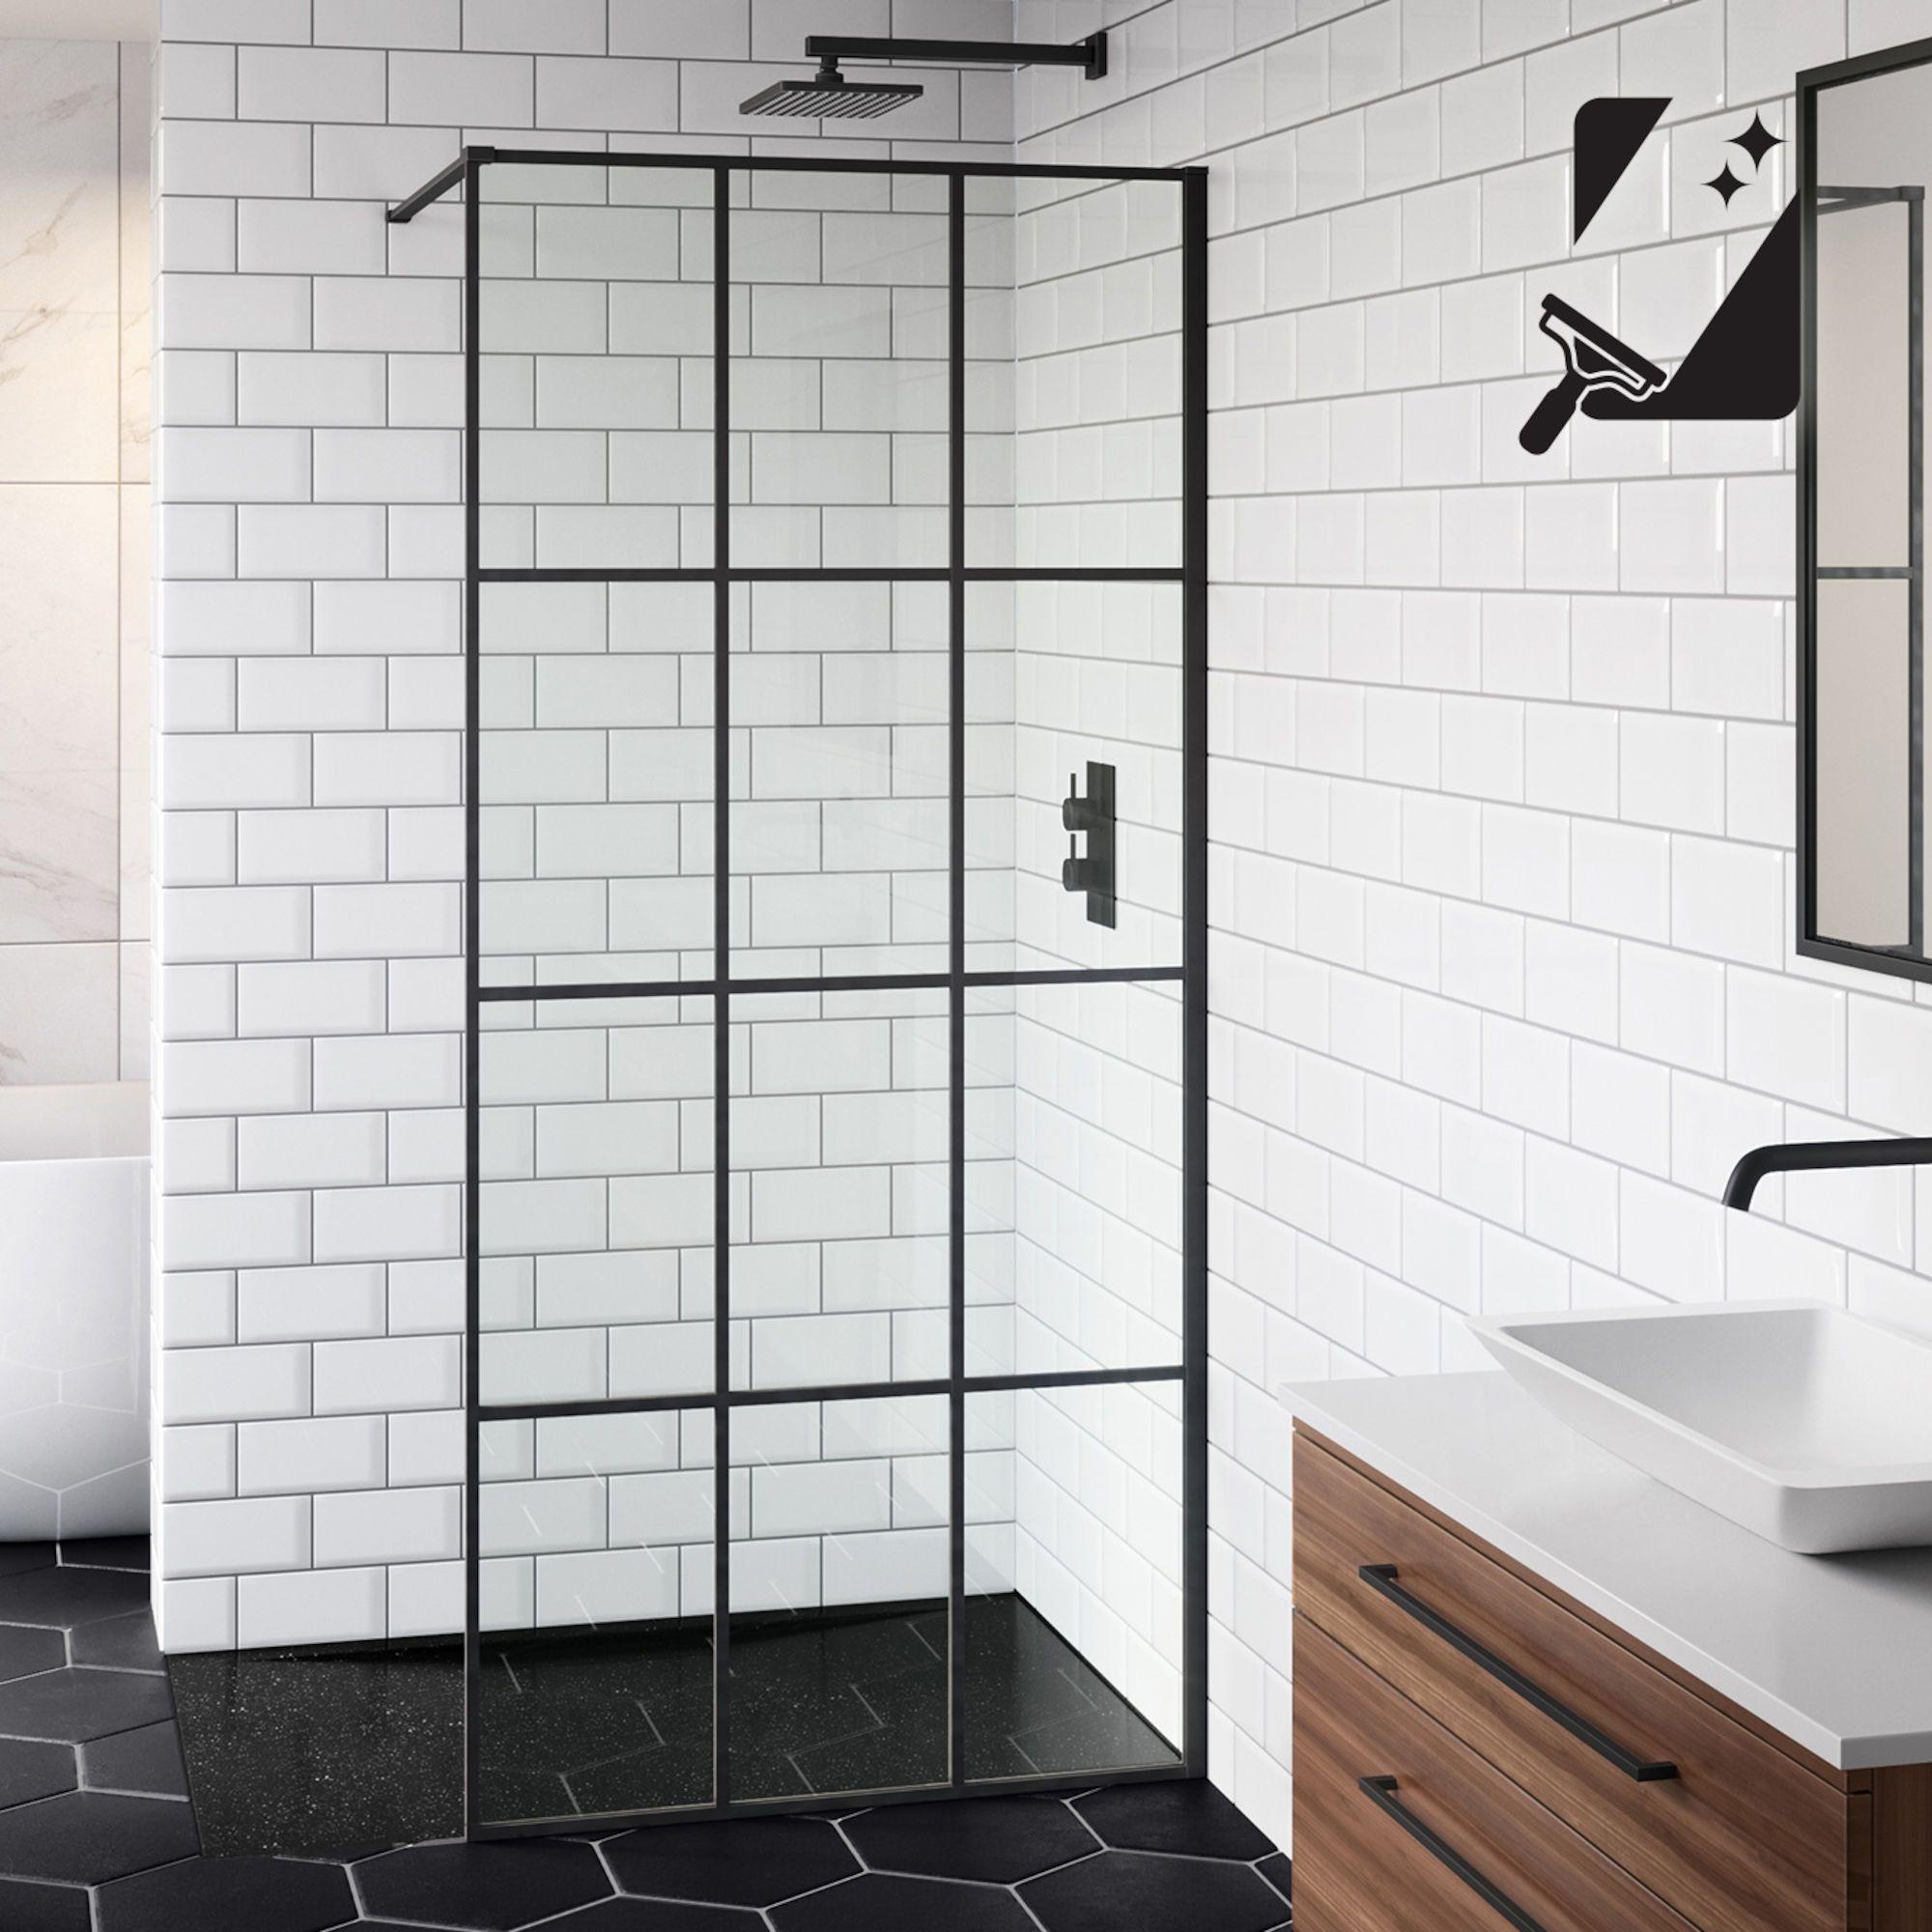 Shoji Crittall Style Shower Screen Black Shower Enclosure Soak Com Black Shower Doors Wet Room Shower Shower Screen